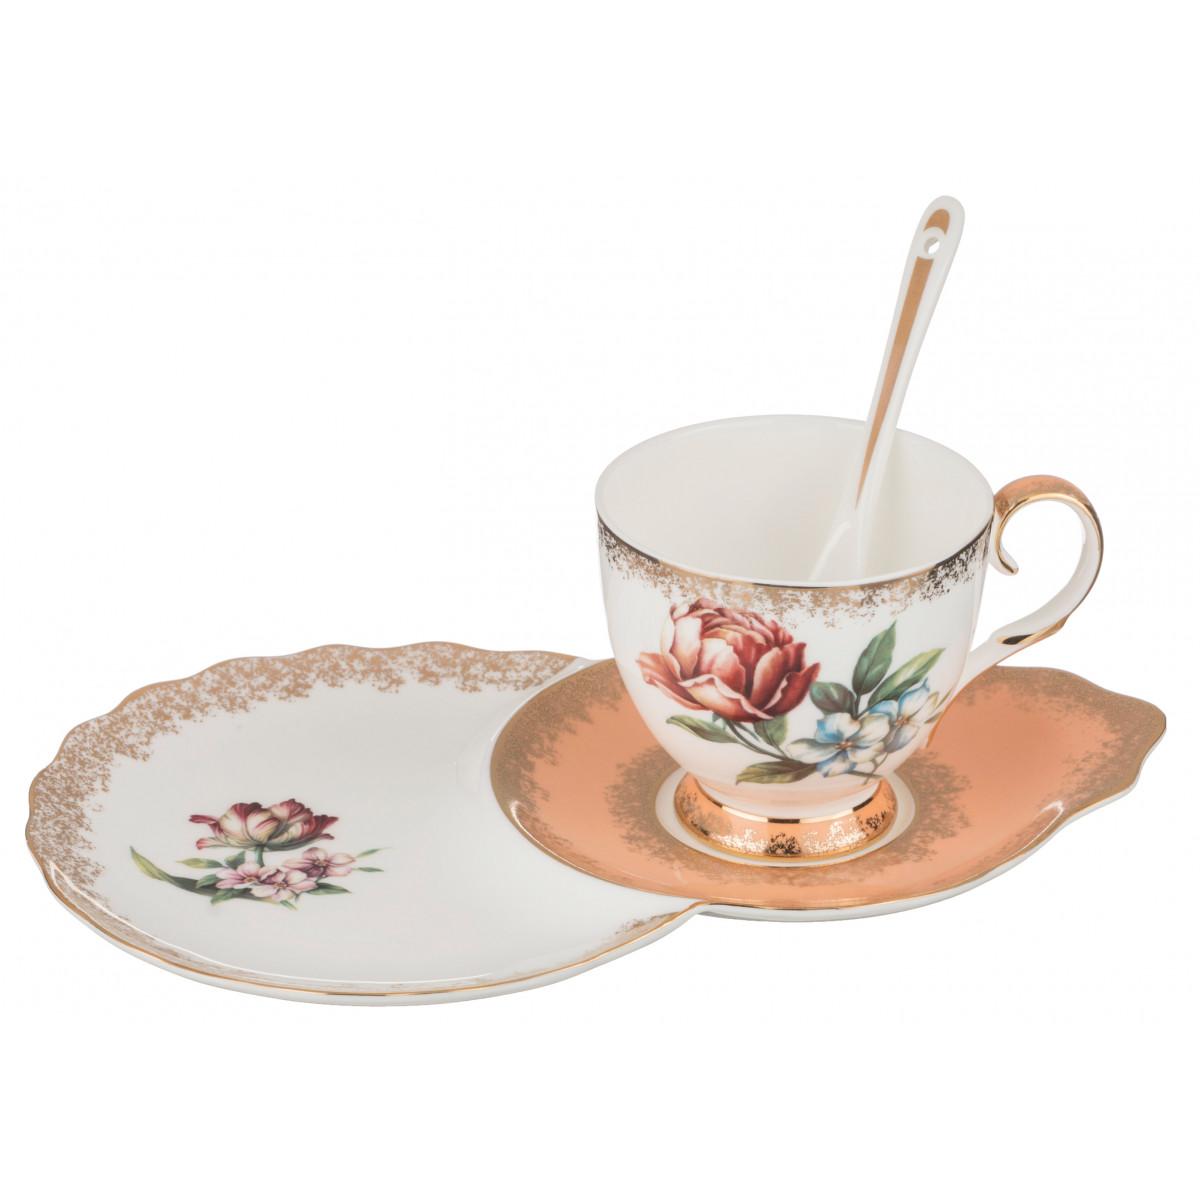 {} Lefard Чайная пара Амелия (250 мл) наборы для чаепития lefard чайная пара венская классика 230мл